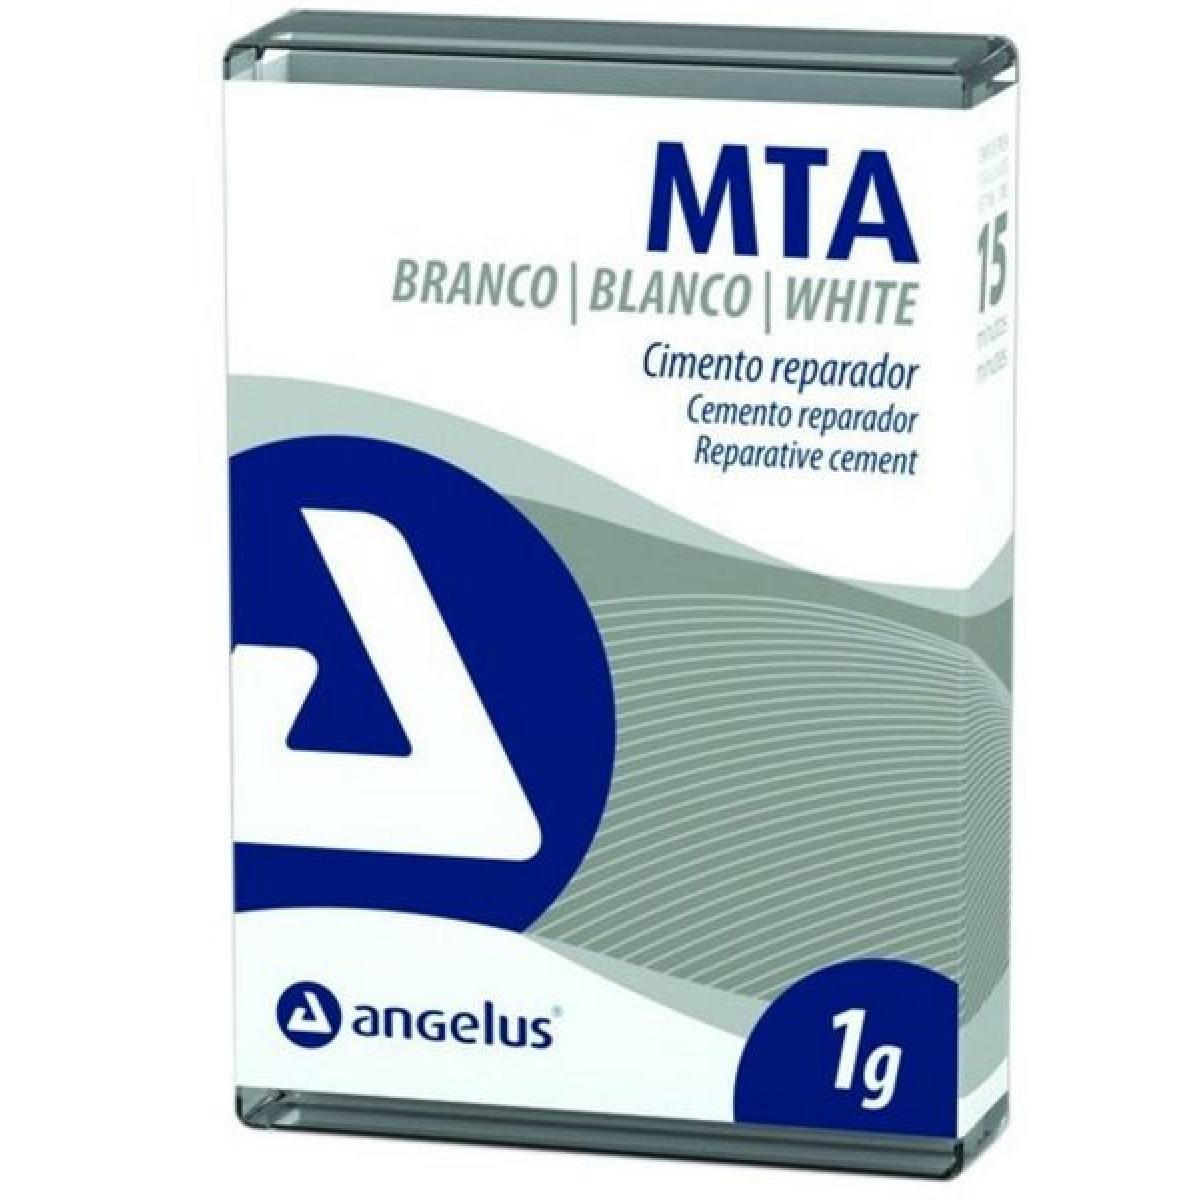 MTA CEMENTO REPARADOR BLANCO 1GR -